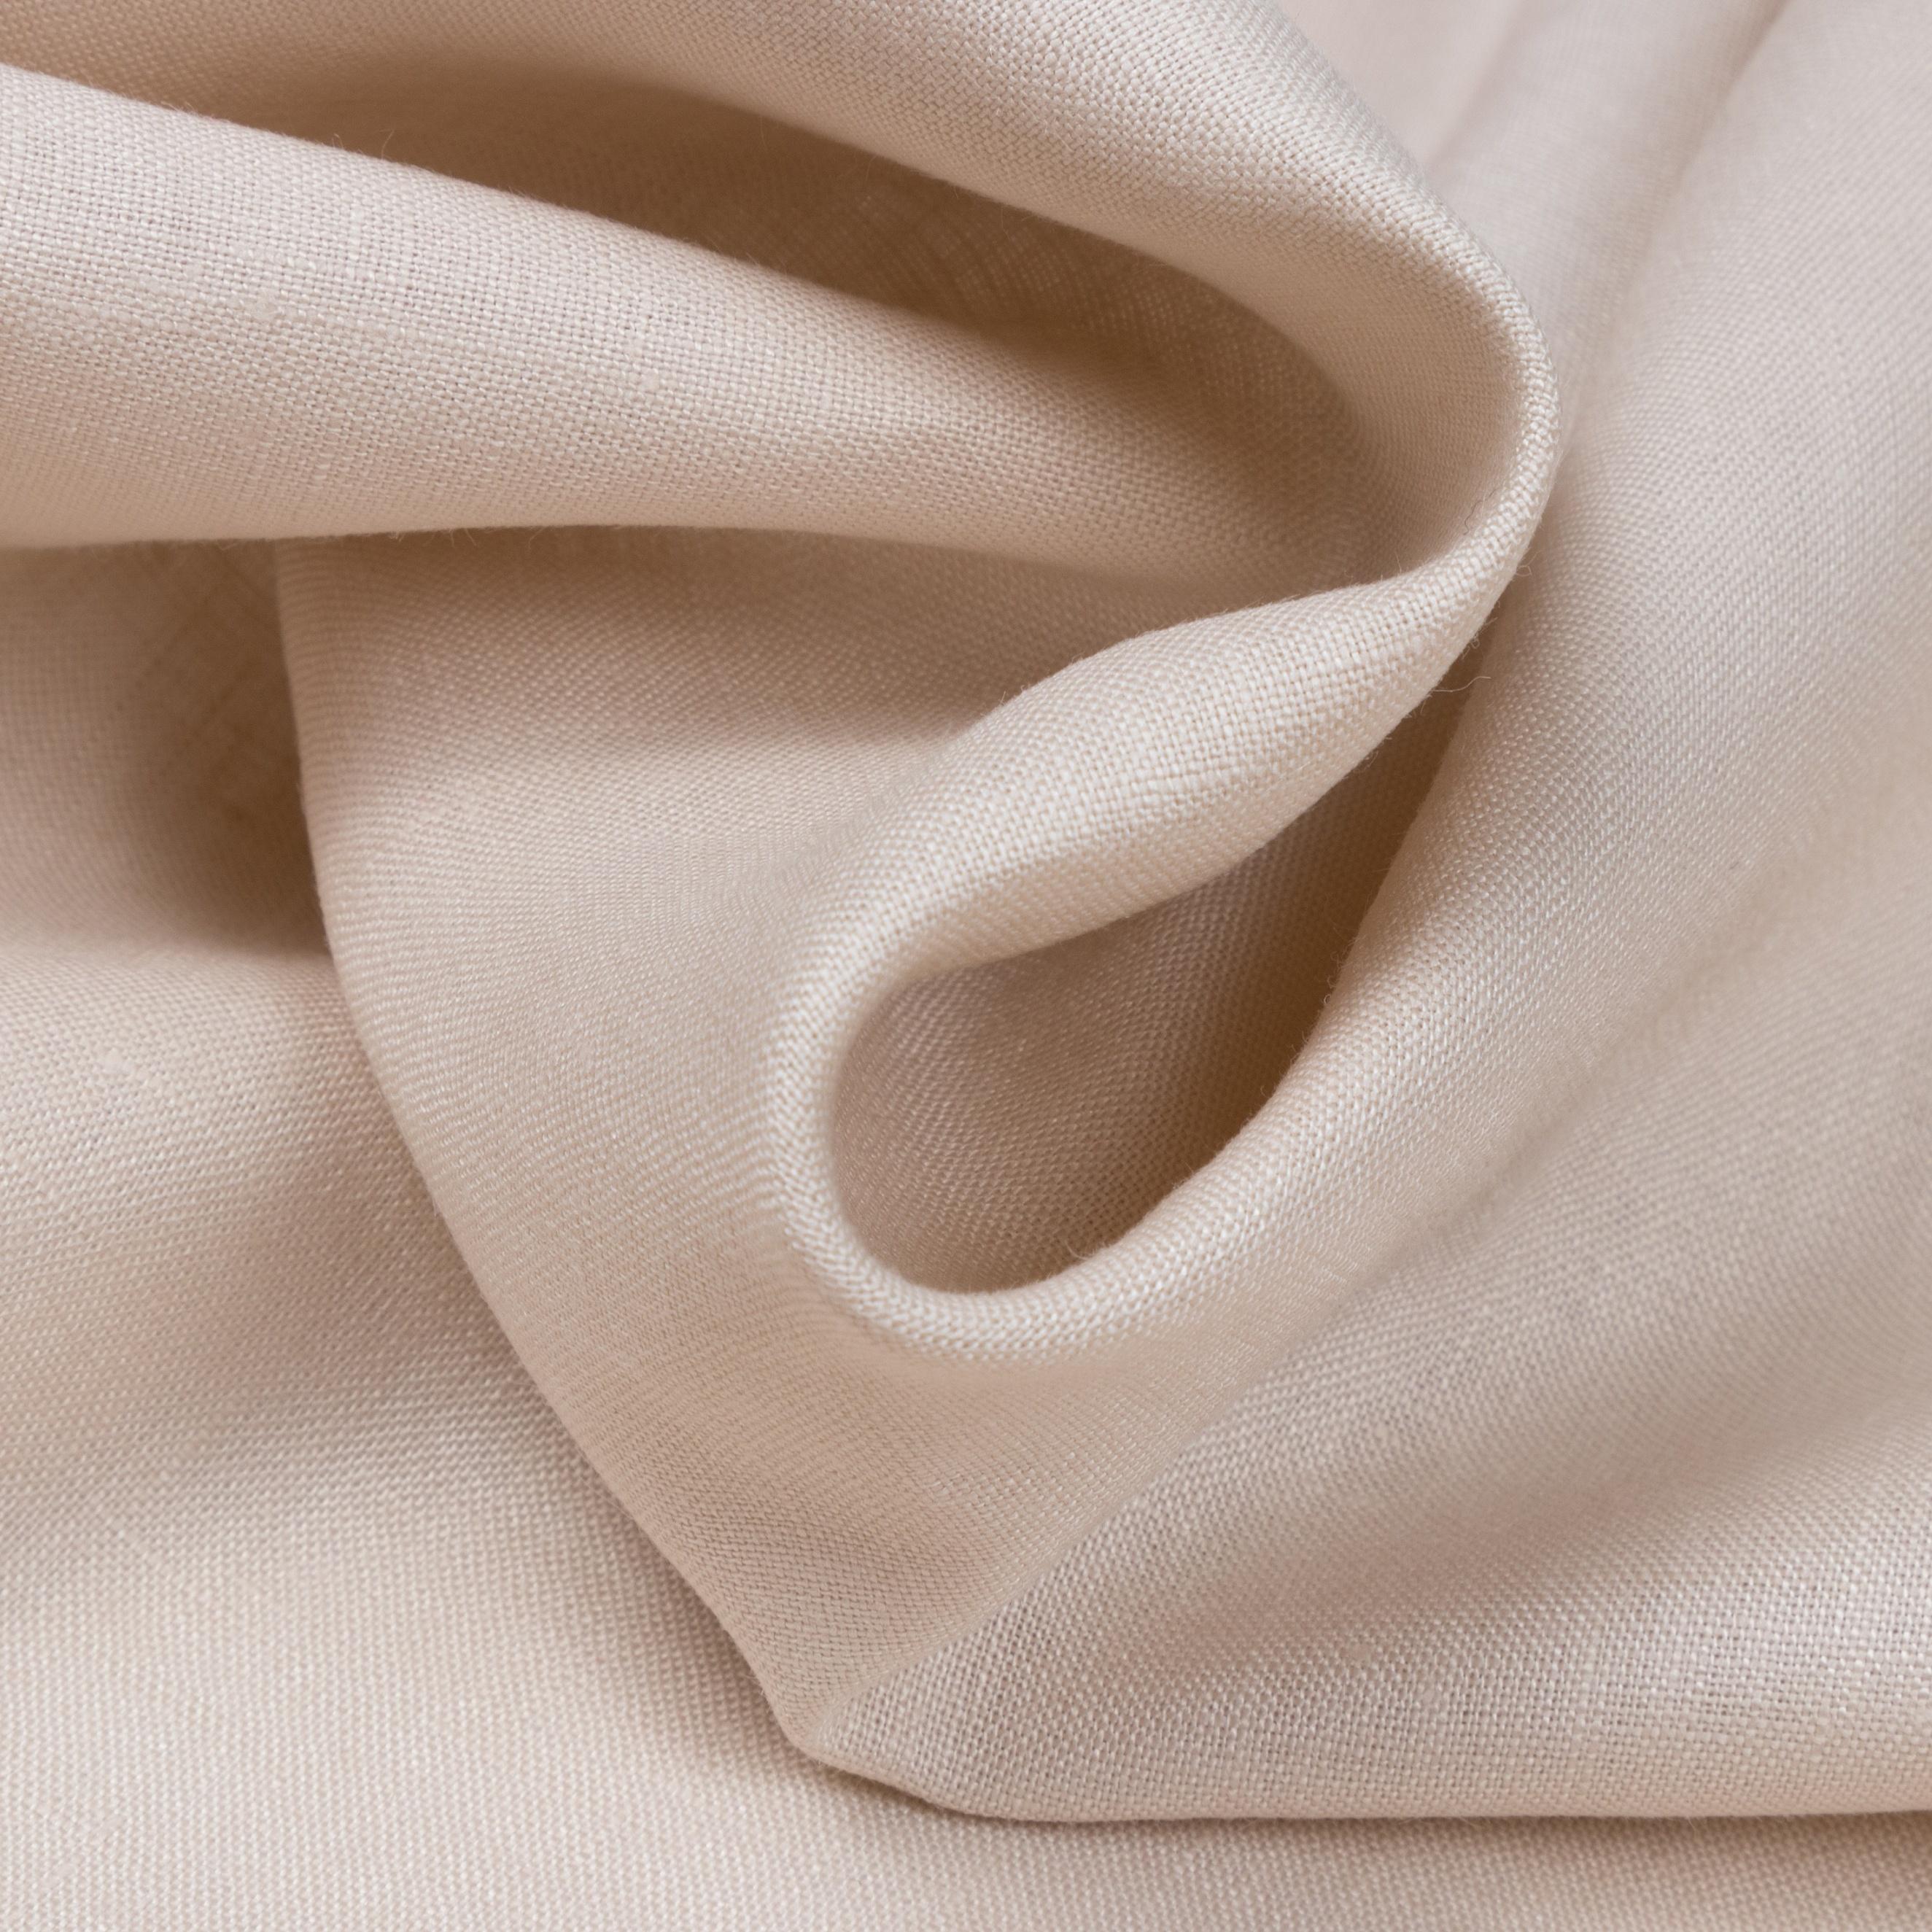 Women Linen Dress Women Loose Casual Clothing,Mens Linen Pants Women Casual,White Table Linen Tablecloth Linen supplier